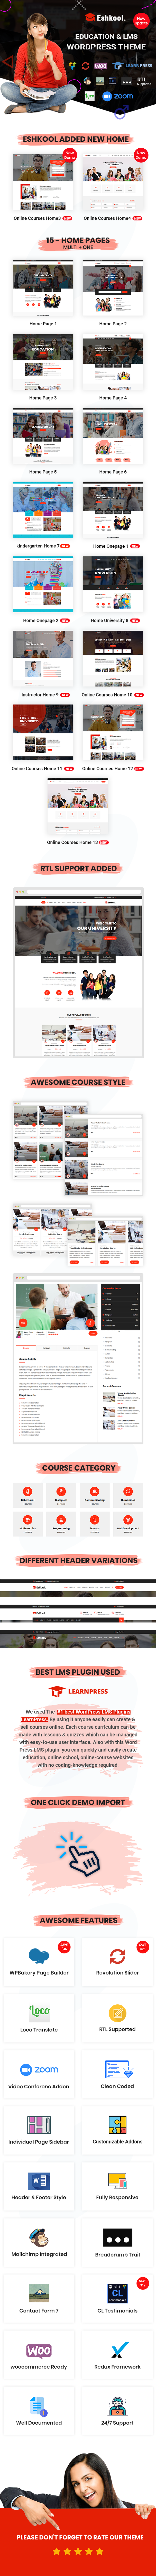 Eshkool - Education & LMS WordPress Theme